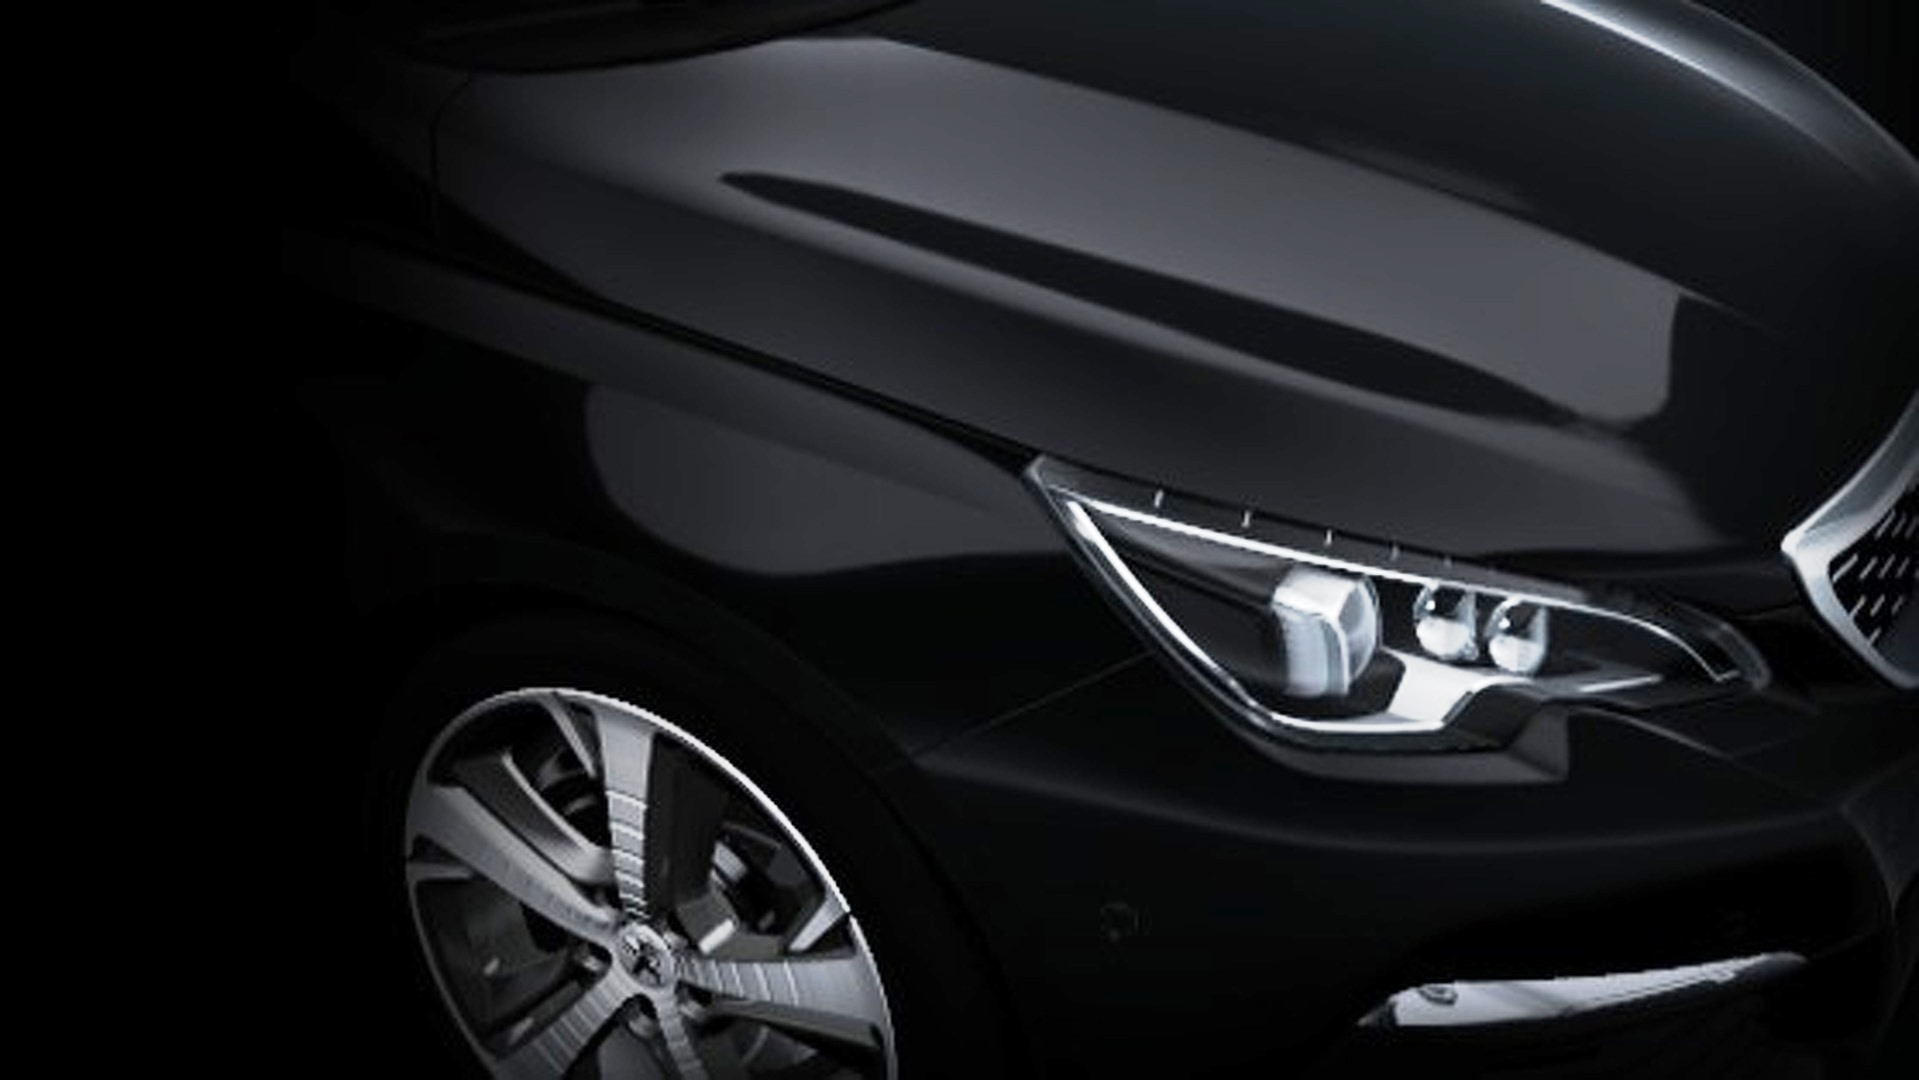 Peugeot 308 Facelift 2018 leaked (4)